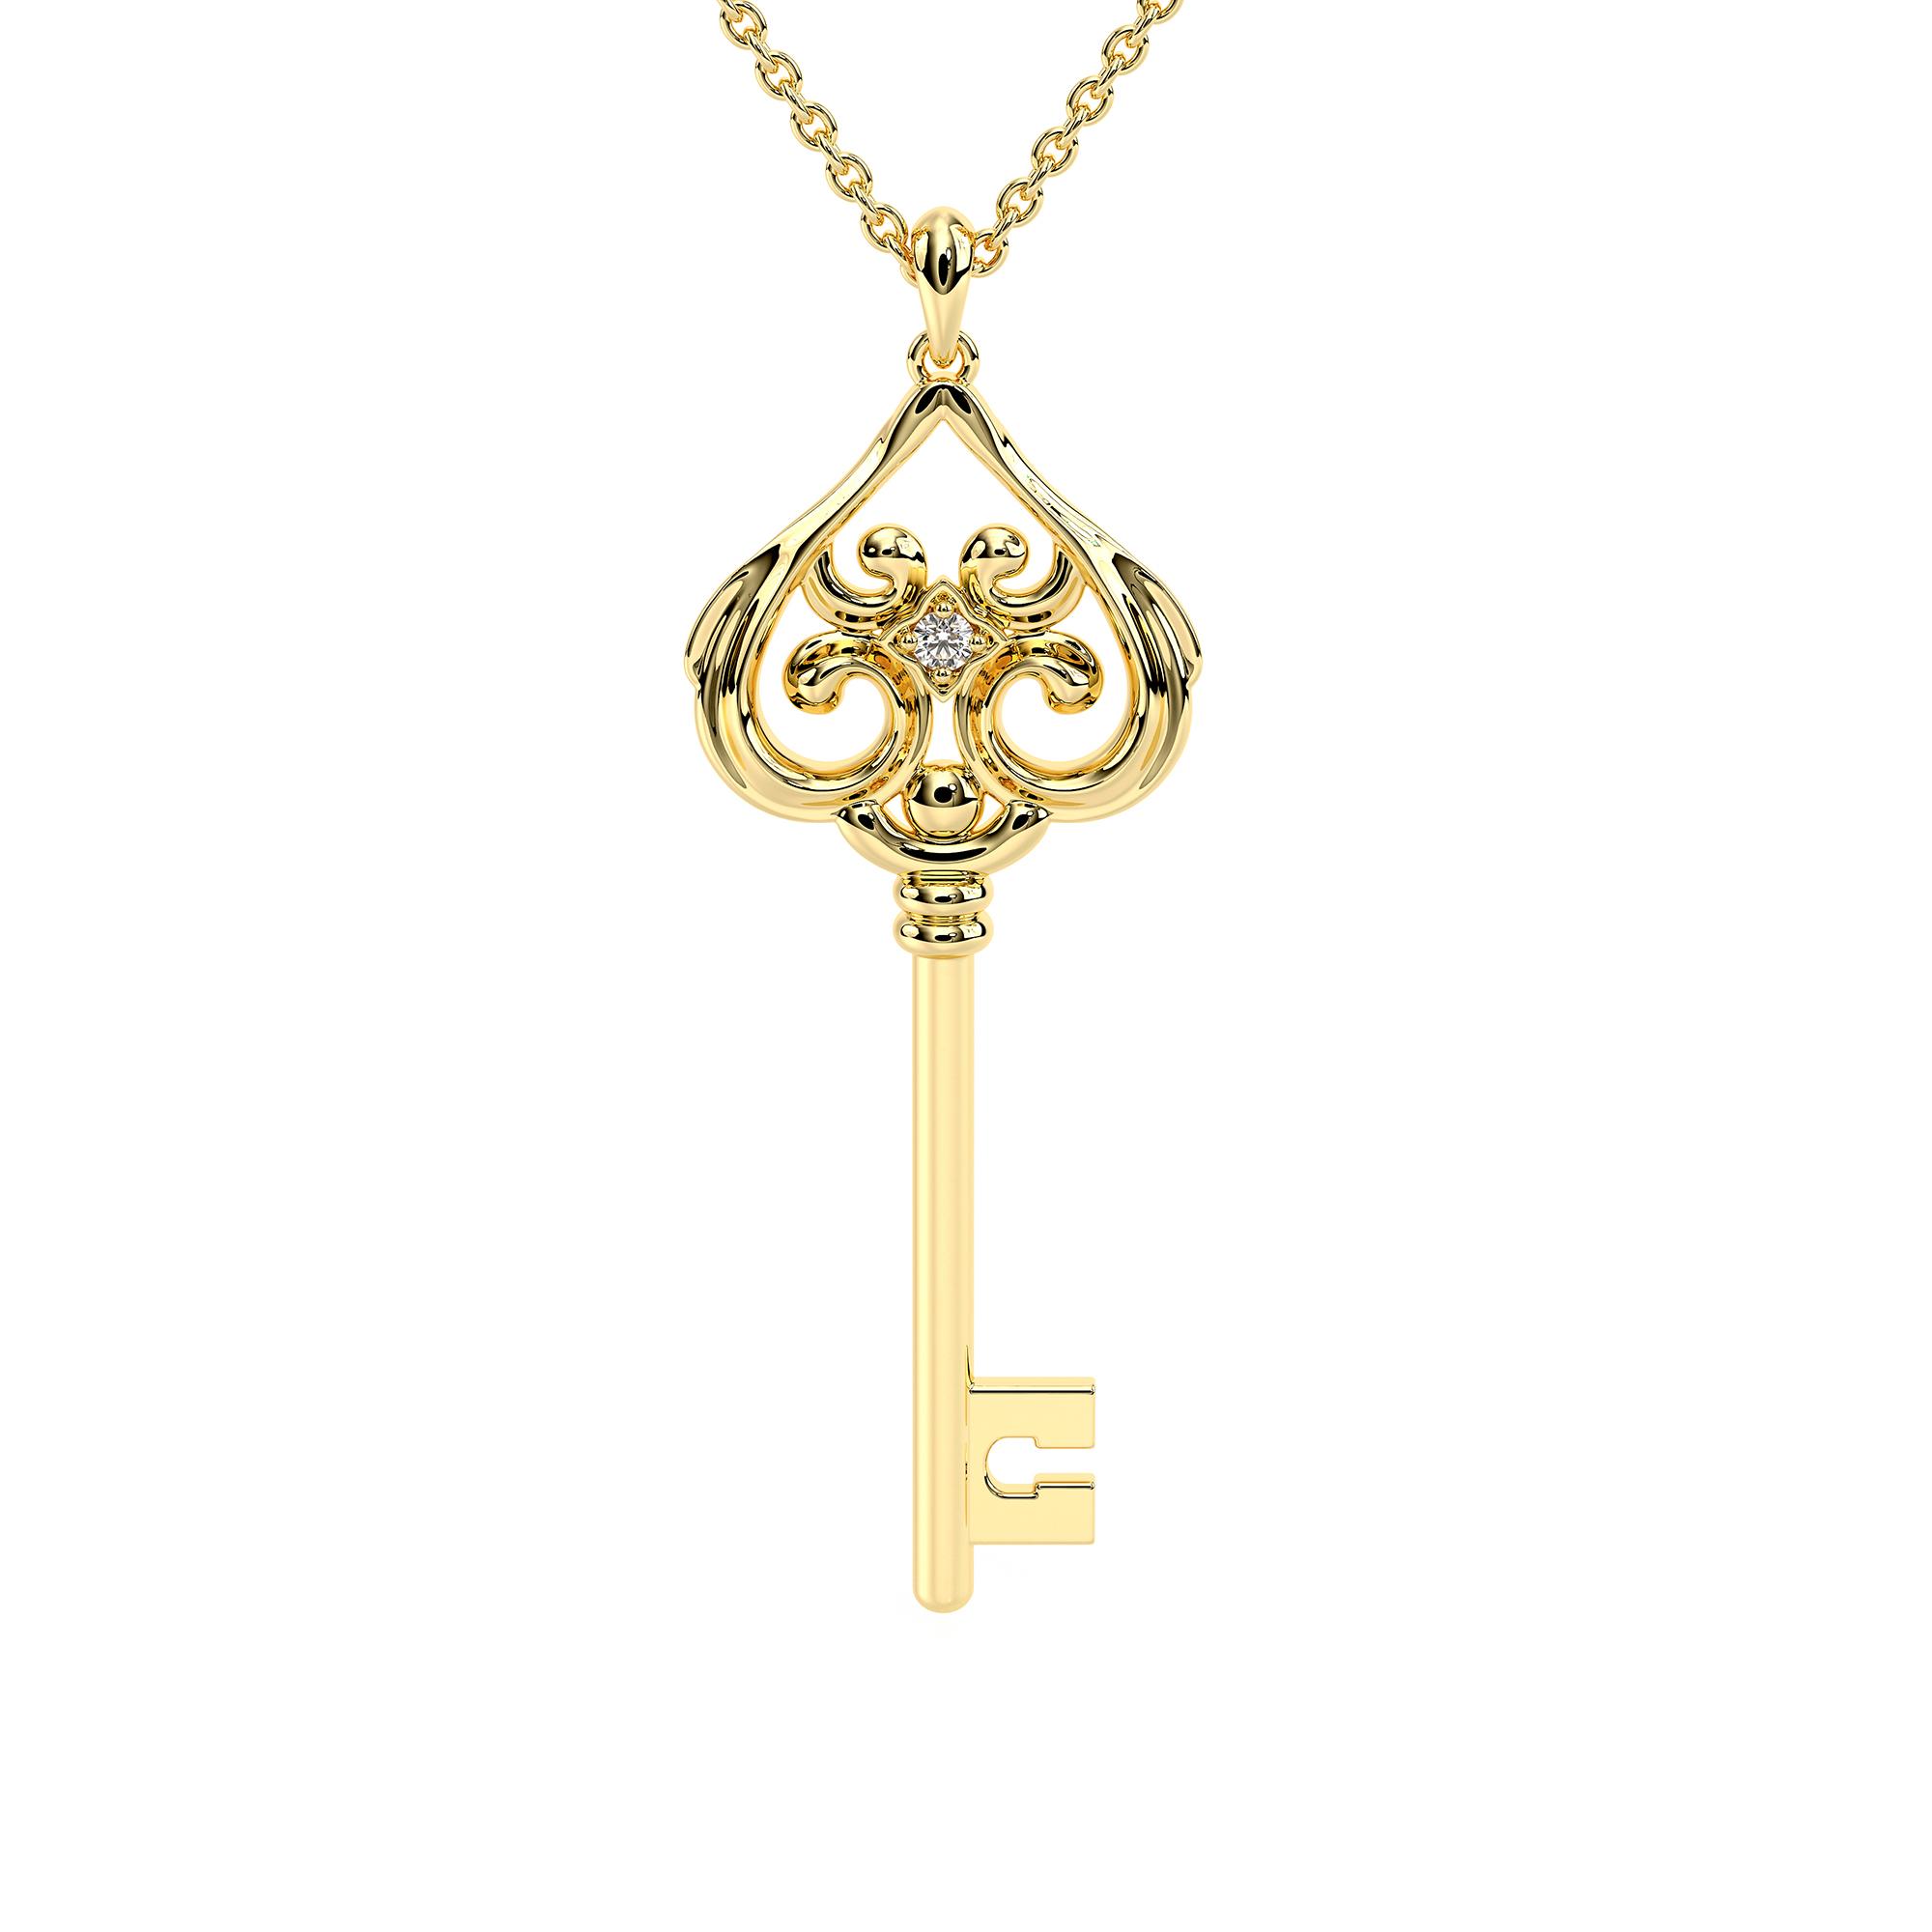 Love Necklace Gold Key Unique Bridal Jewelry Wedding Pendants